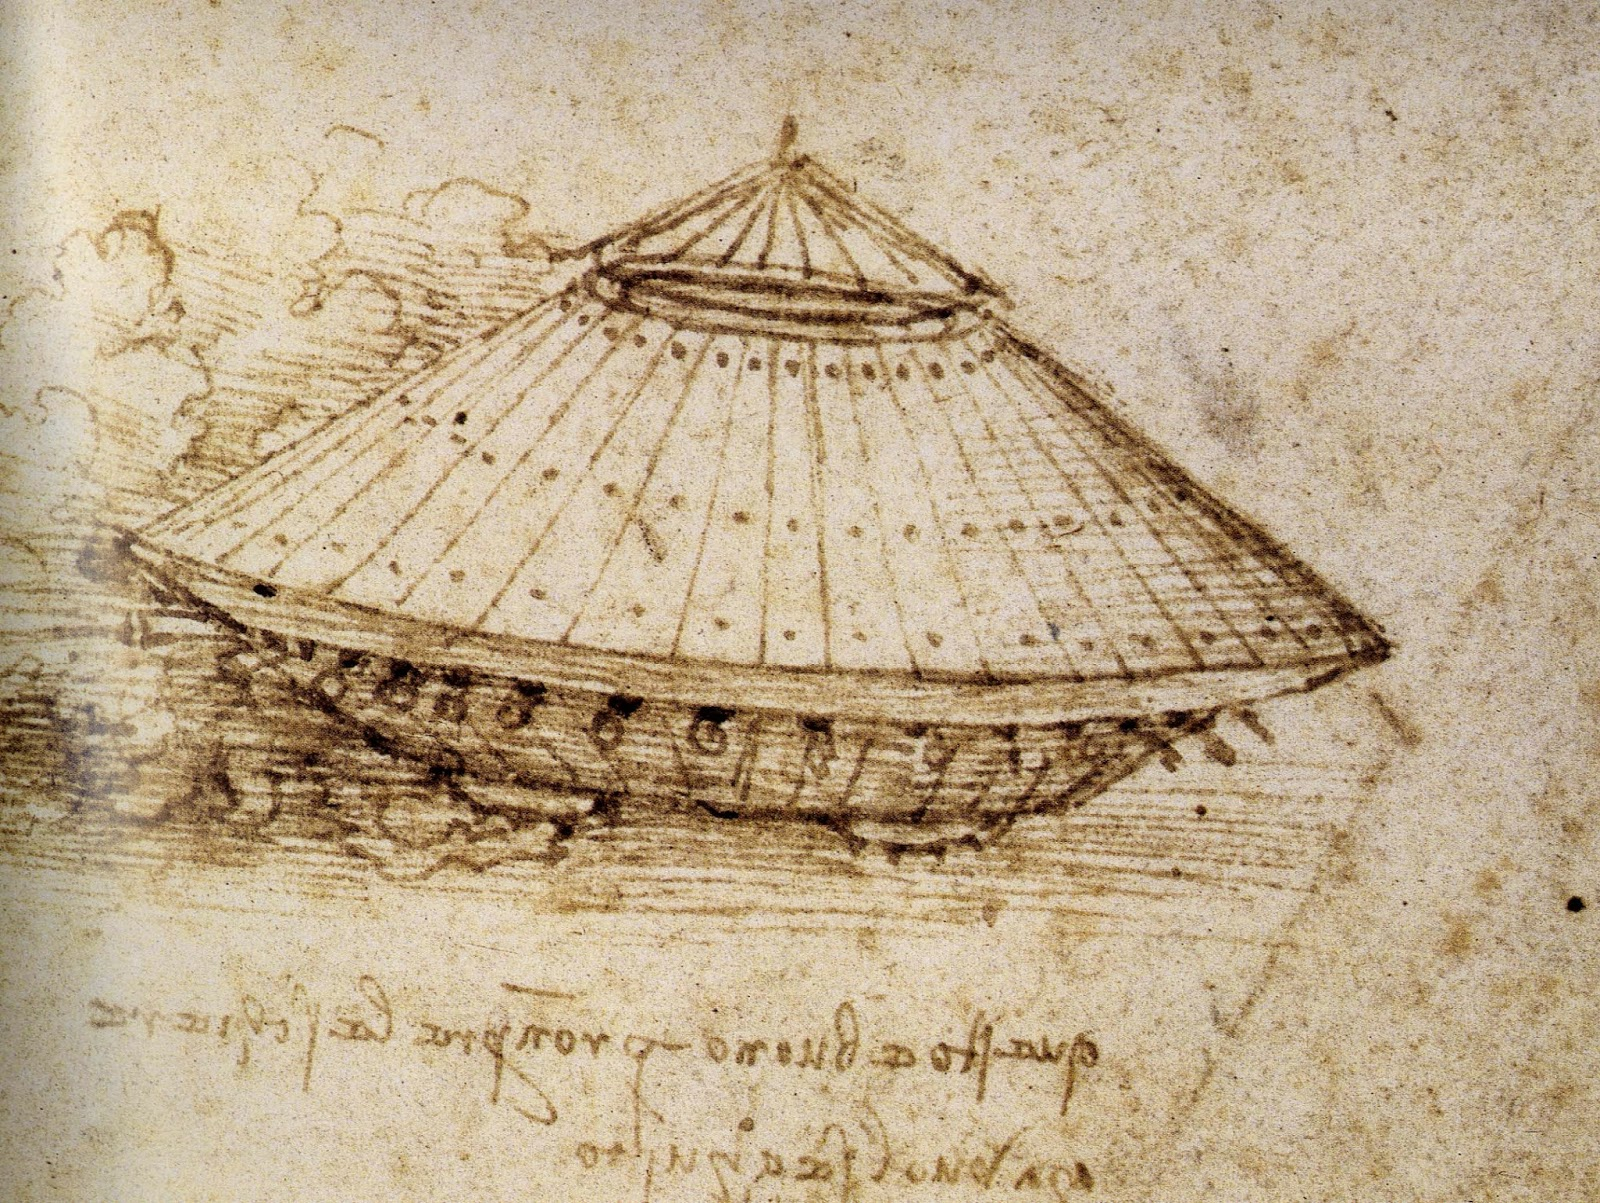 Joyful Art Drawings Of Leonardo Da Vinci